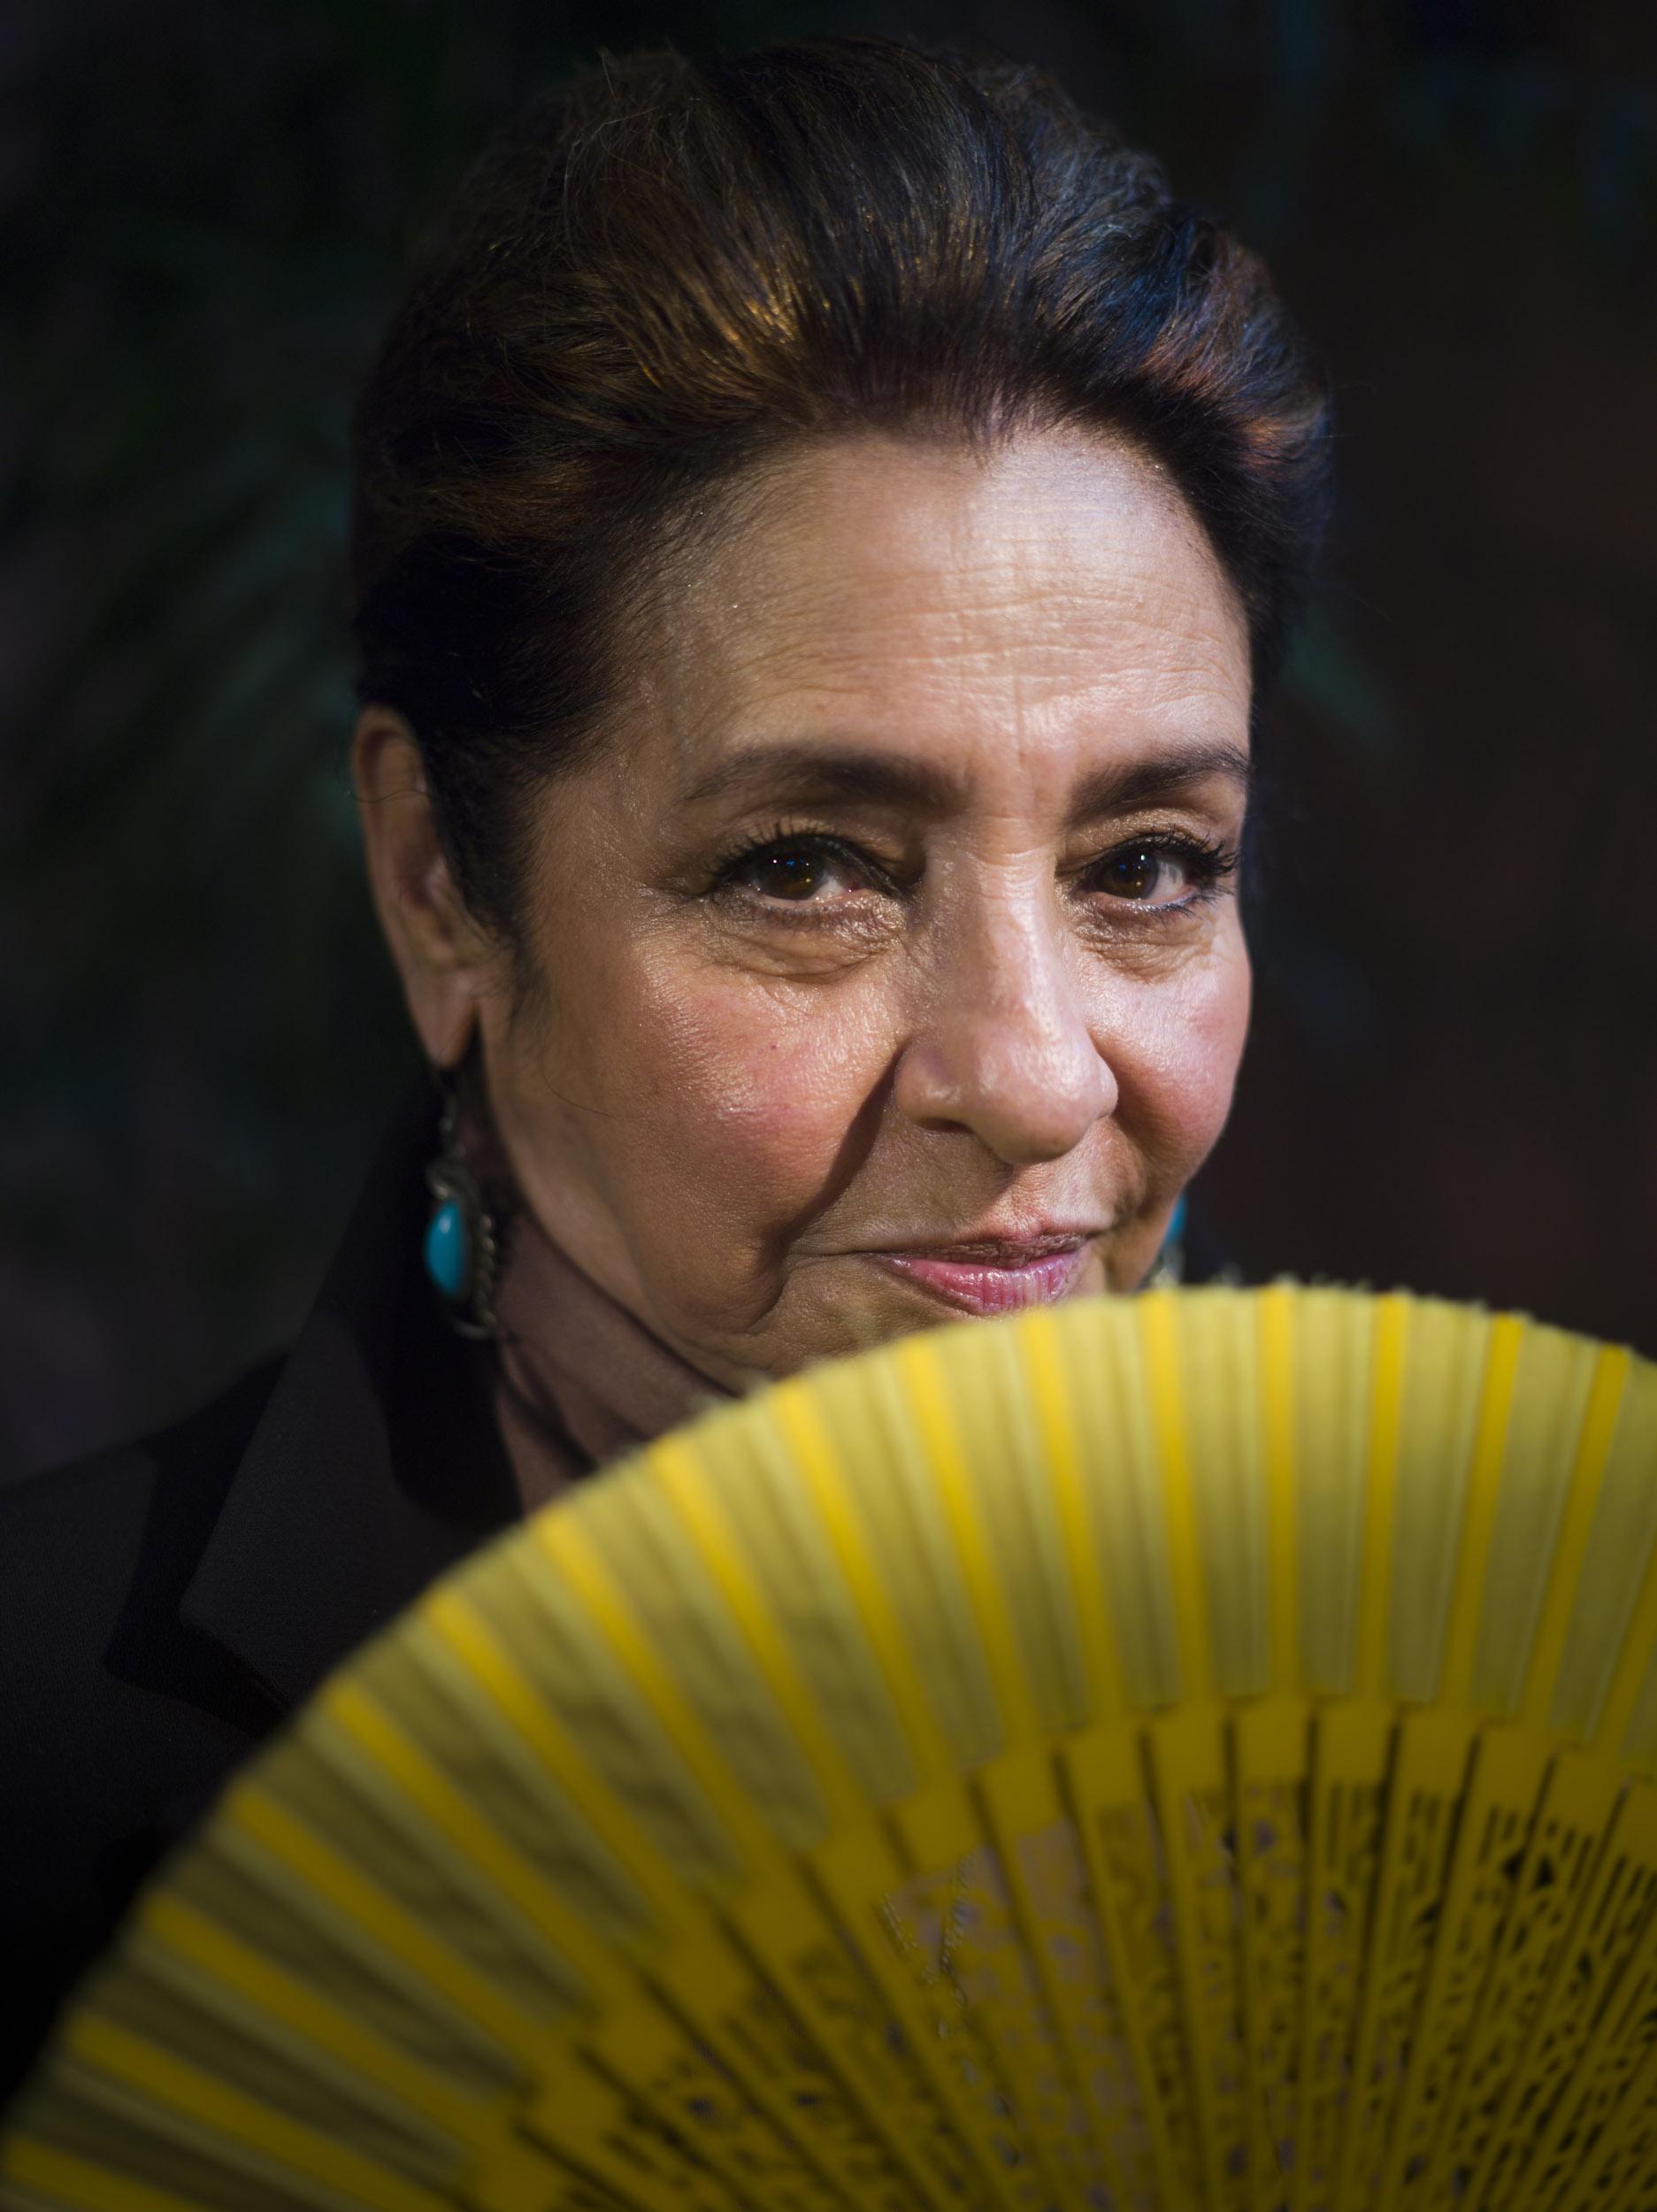 Daisy Granados, actress - Illuminated Cuba - Hector Garrido, Aerial and human photography